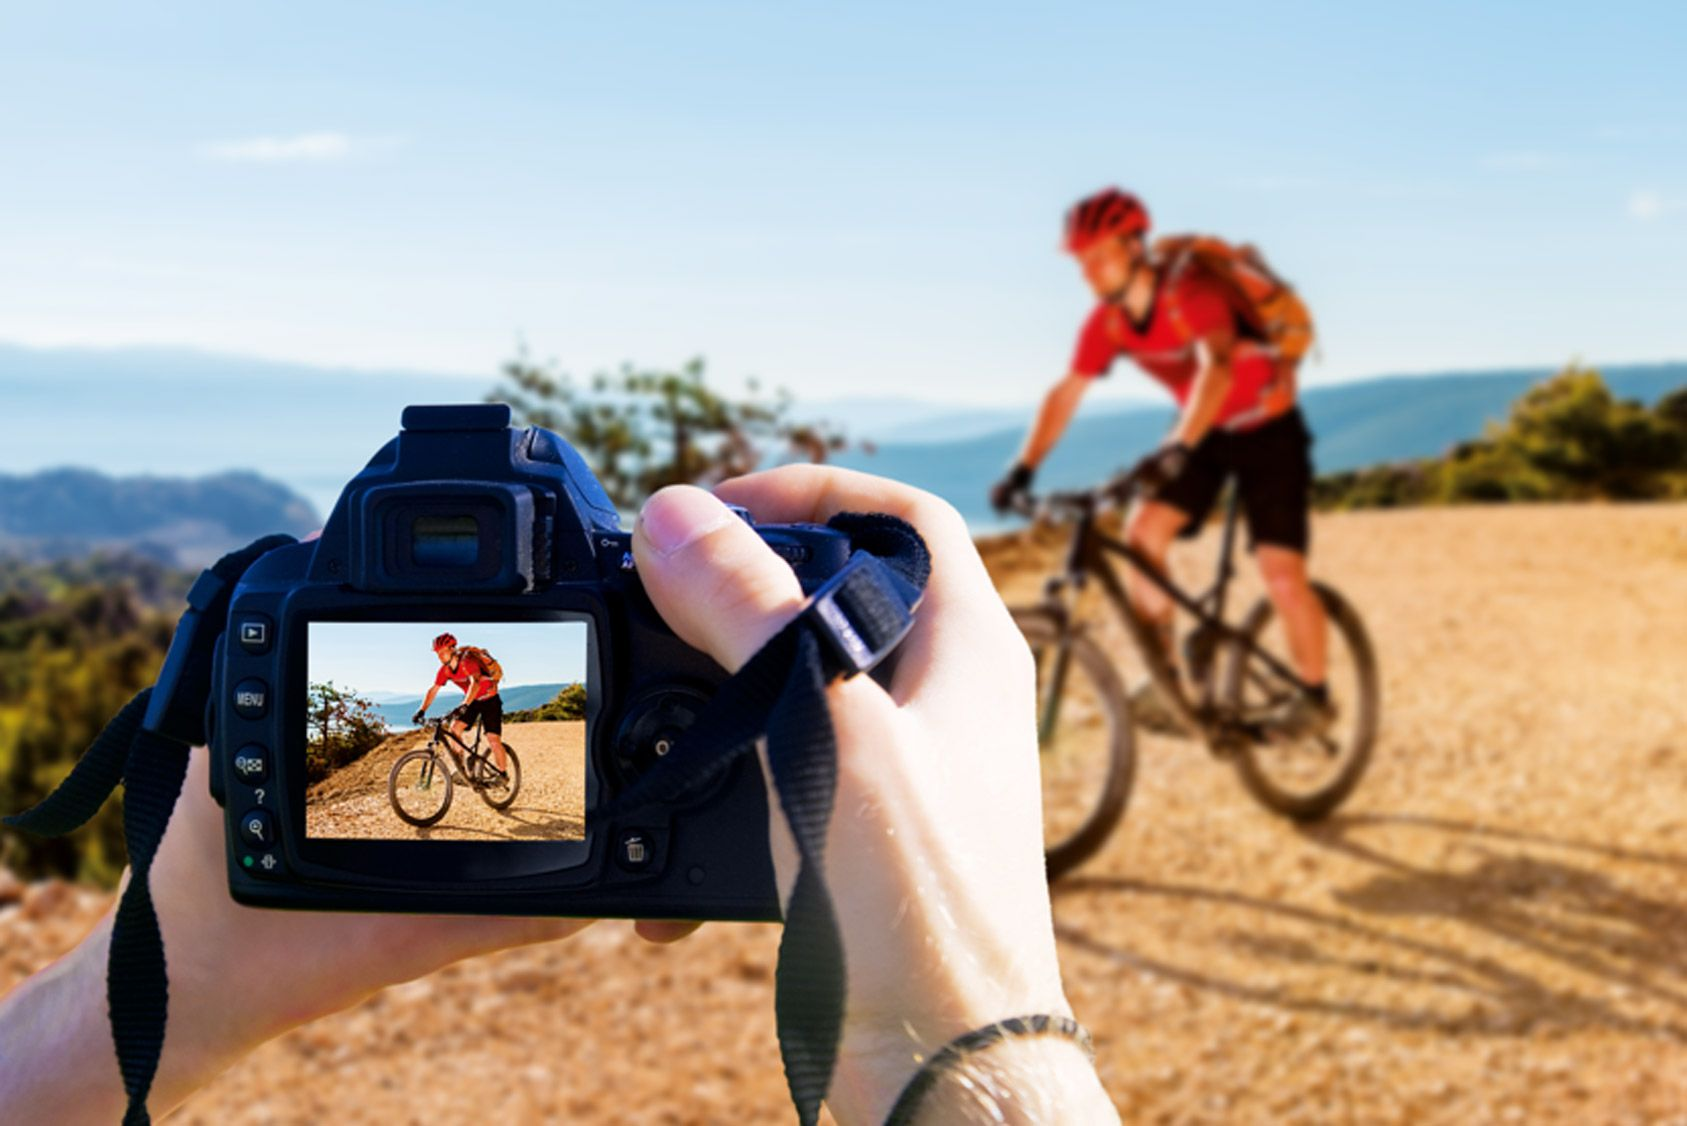 Mode d'emploi: savoir régler son appareil photo